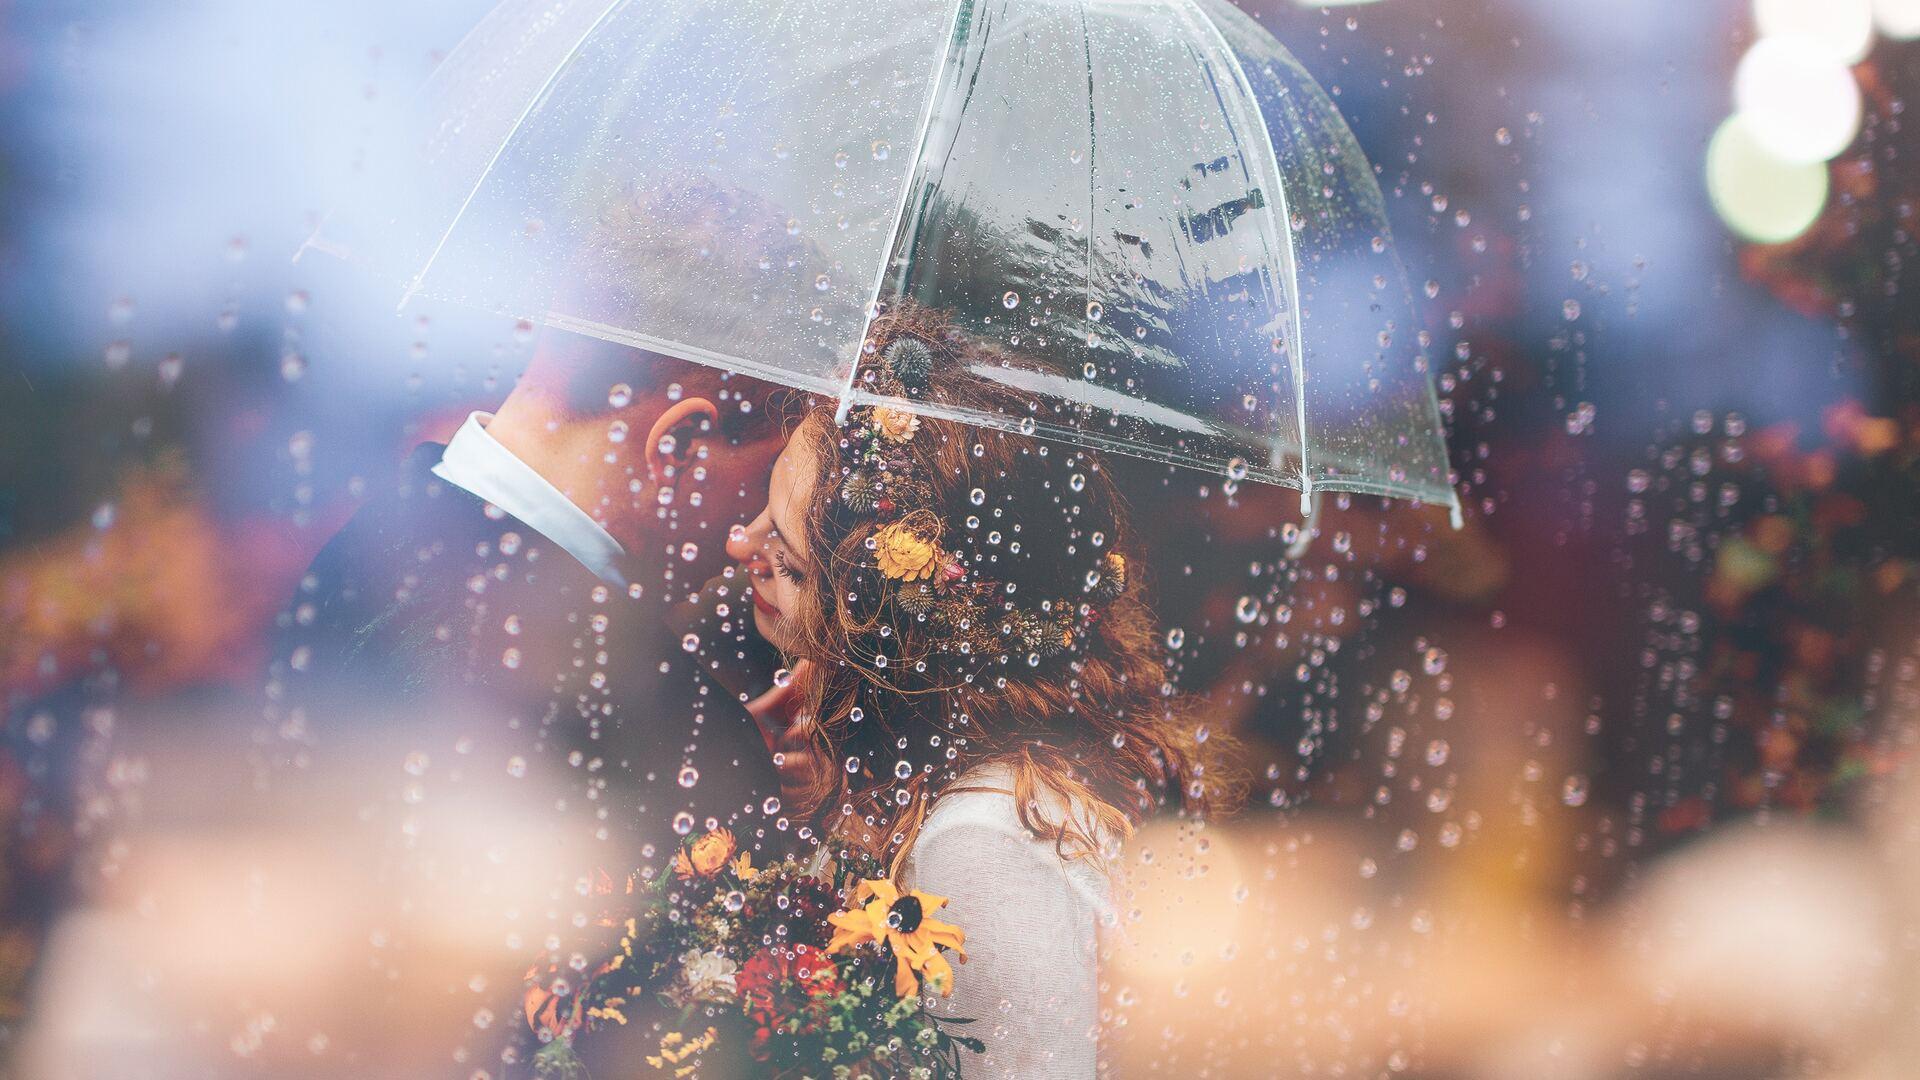 52+ Download Wallpaper Android Romantis Gratis